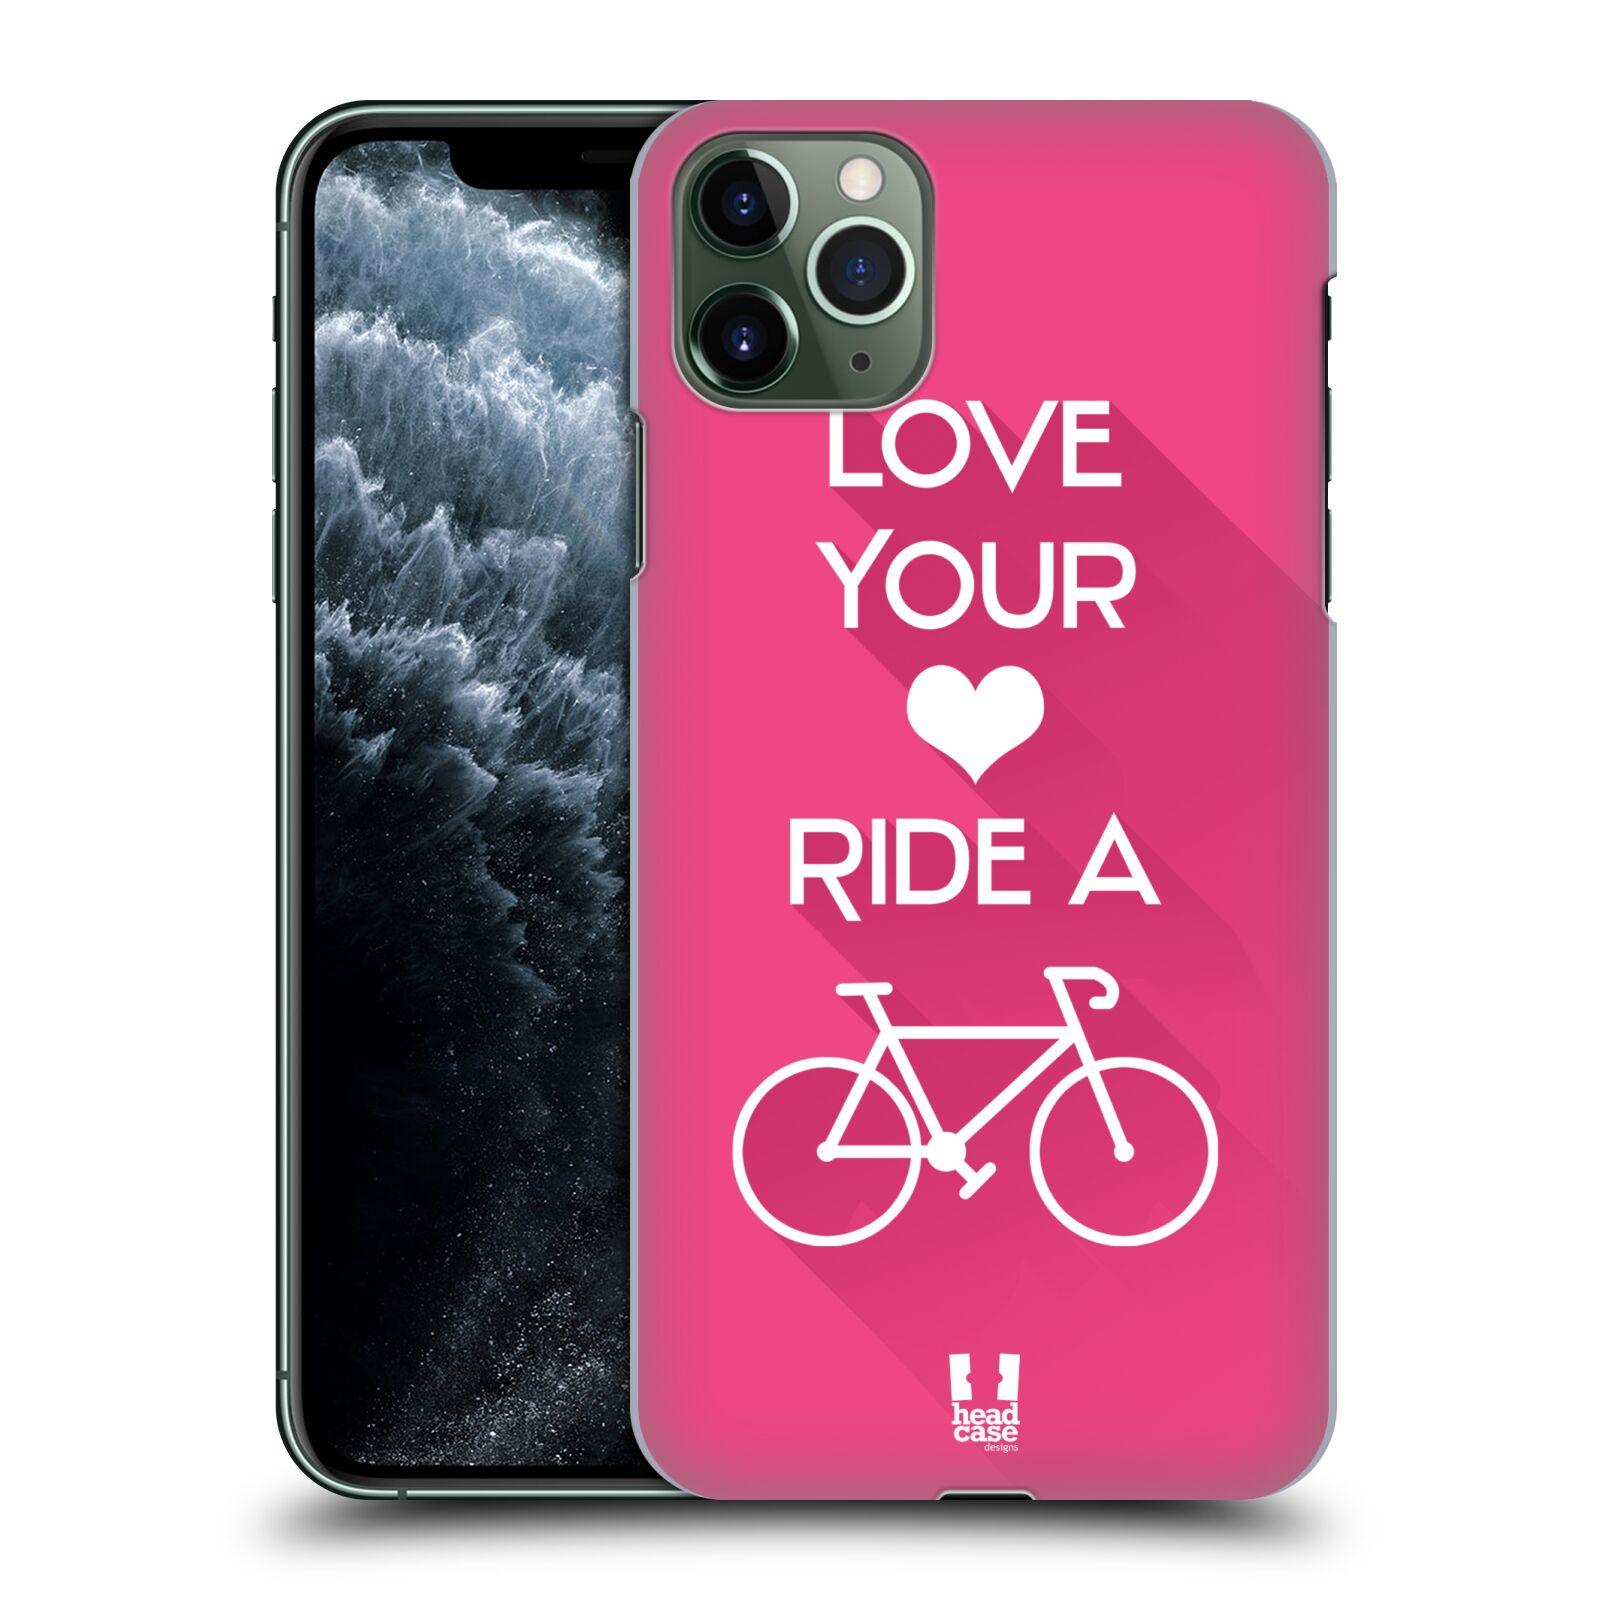 Pouzdro na mobil Apple Iphone 11 PRO MAX - HEAD CASE - Cyklista růžové pozadí kolo sport